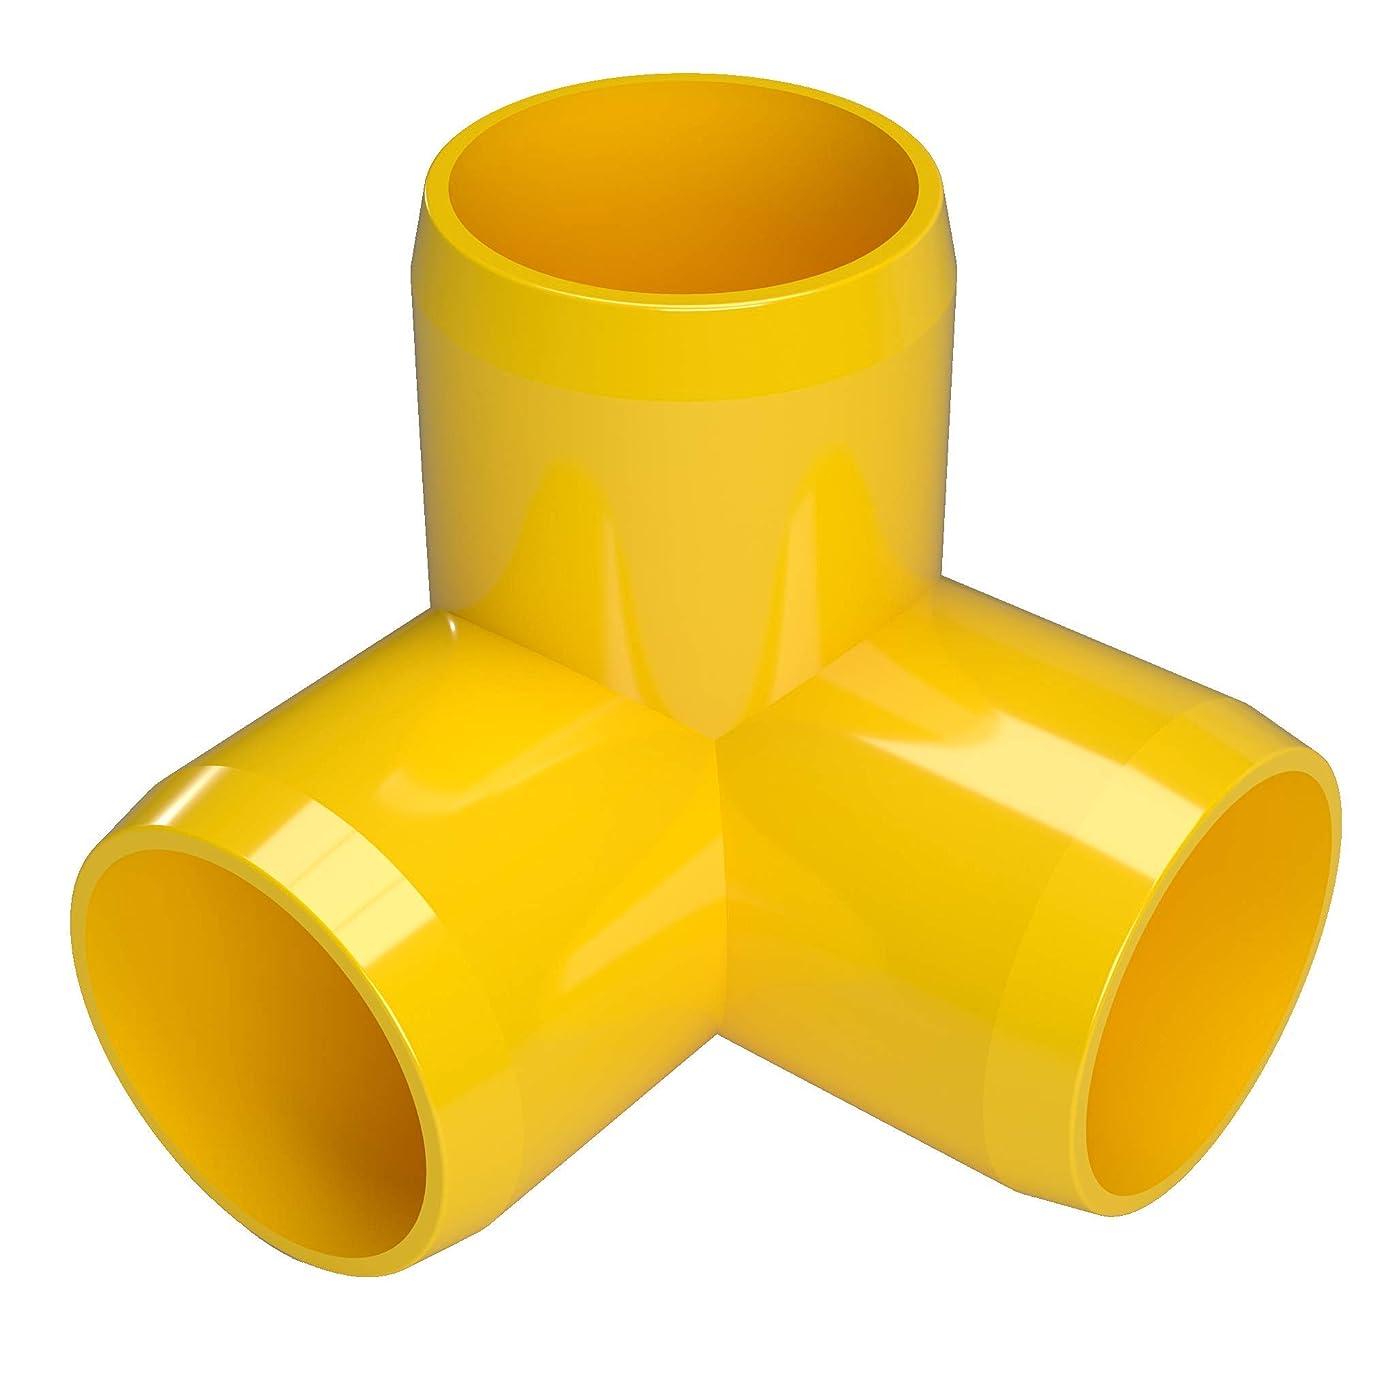 FORMUFIT F1143WE-YE-4 3-Way Elbow PVC Fitting, Furniture Grade, 1-1/4